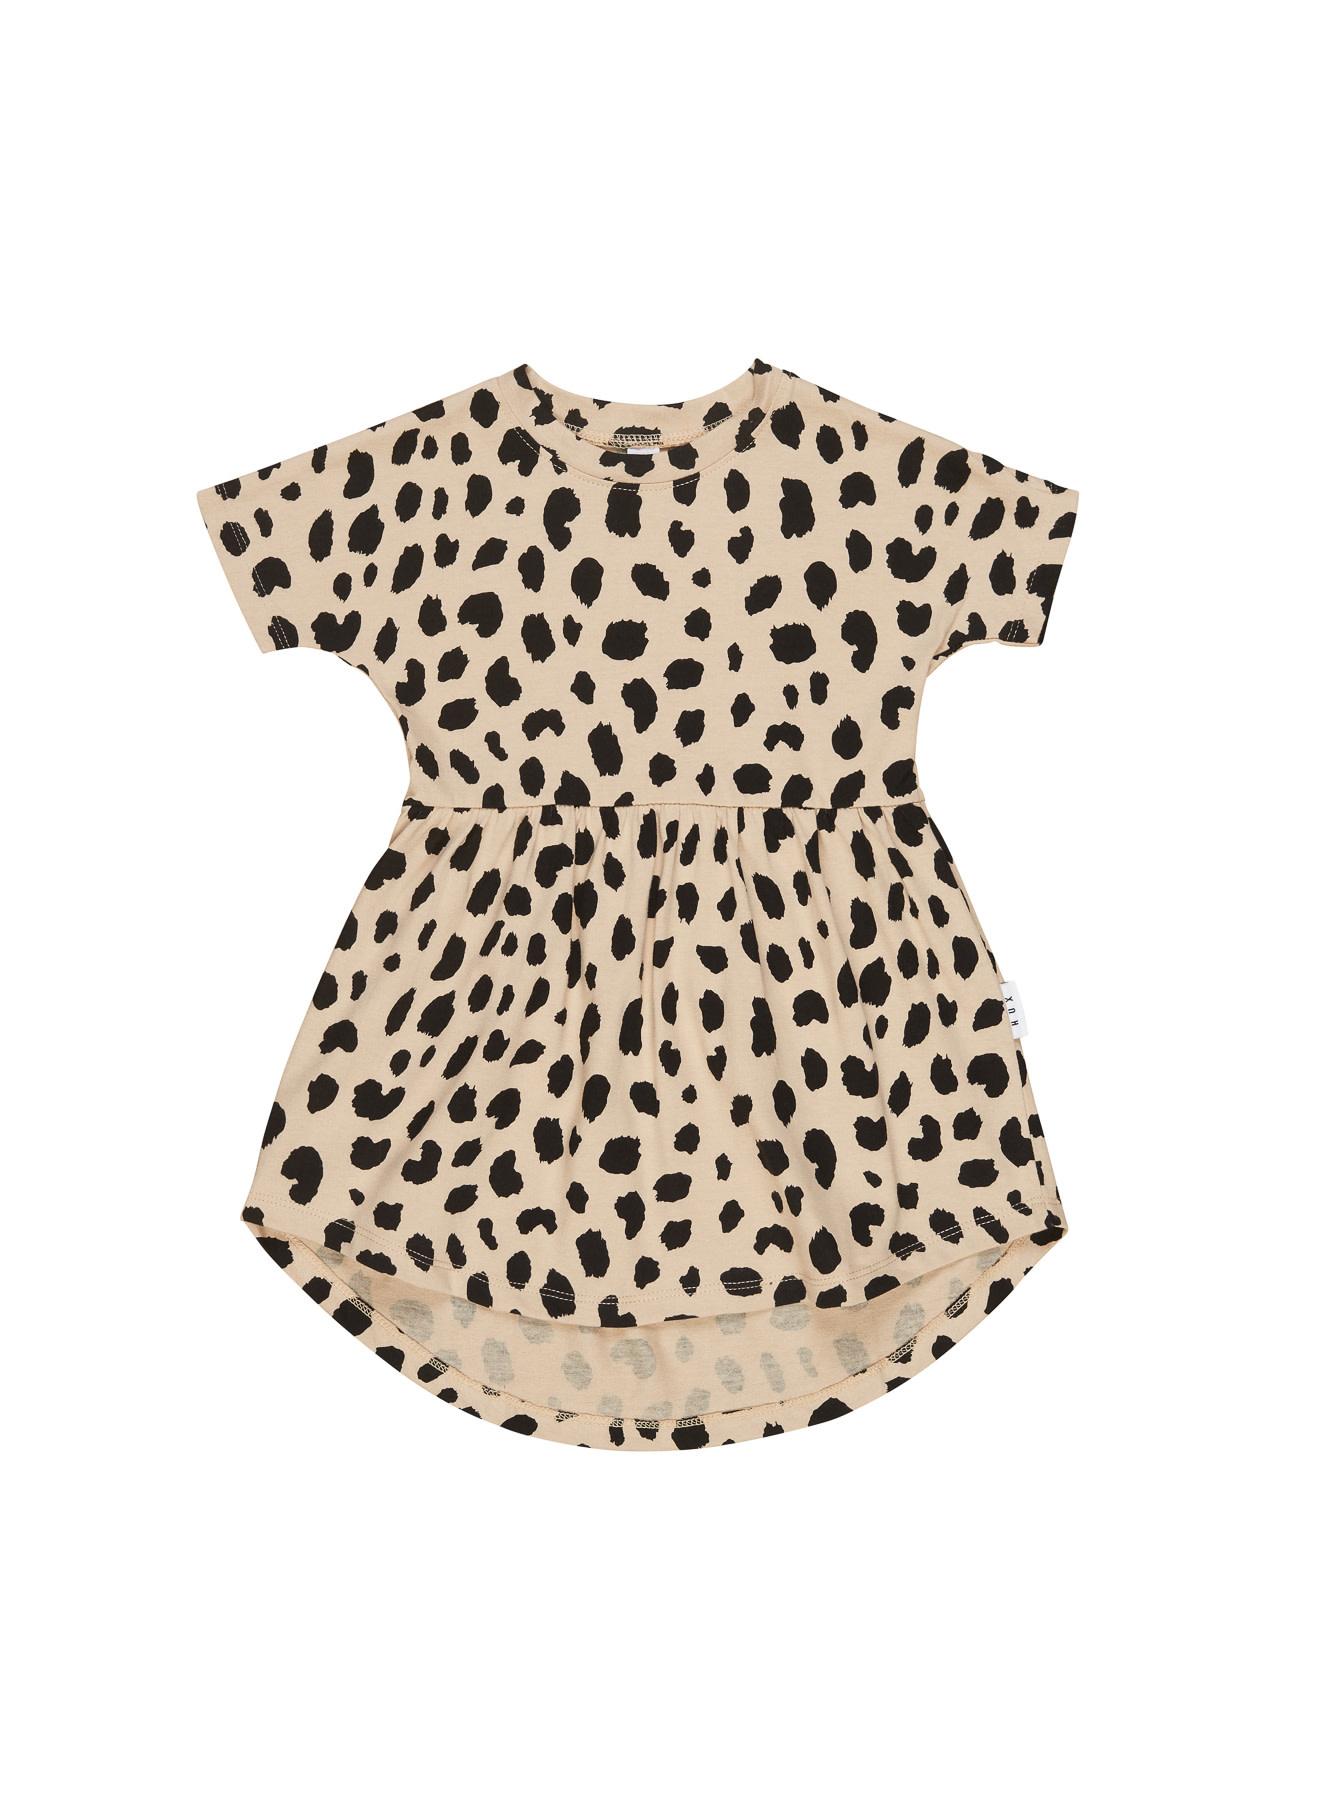 HUX BABY Animal Spot Swirl Dress